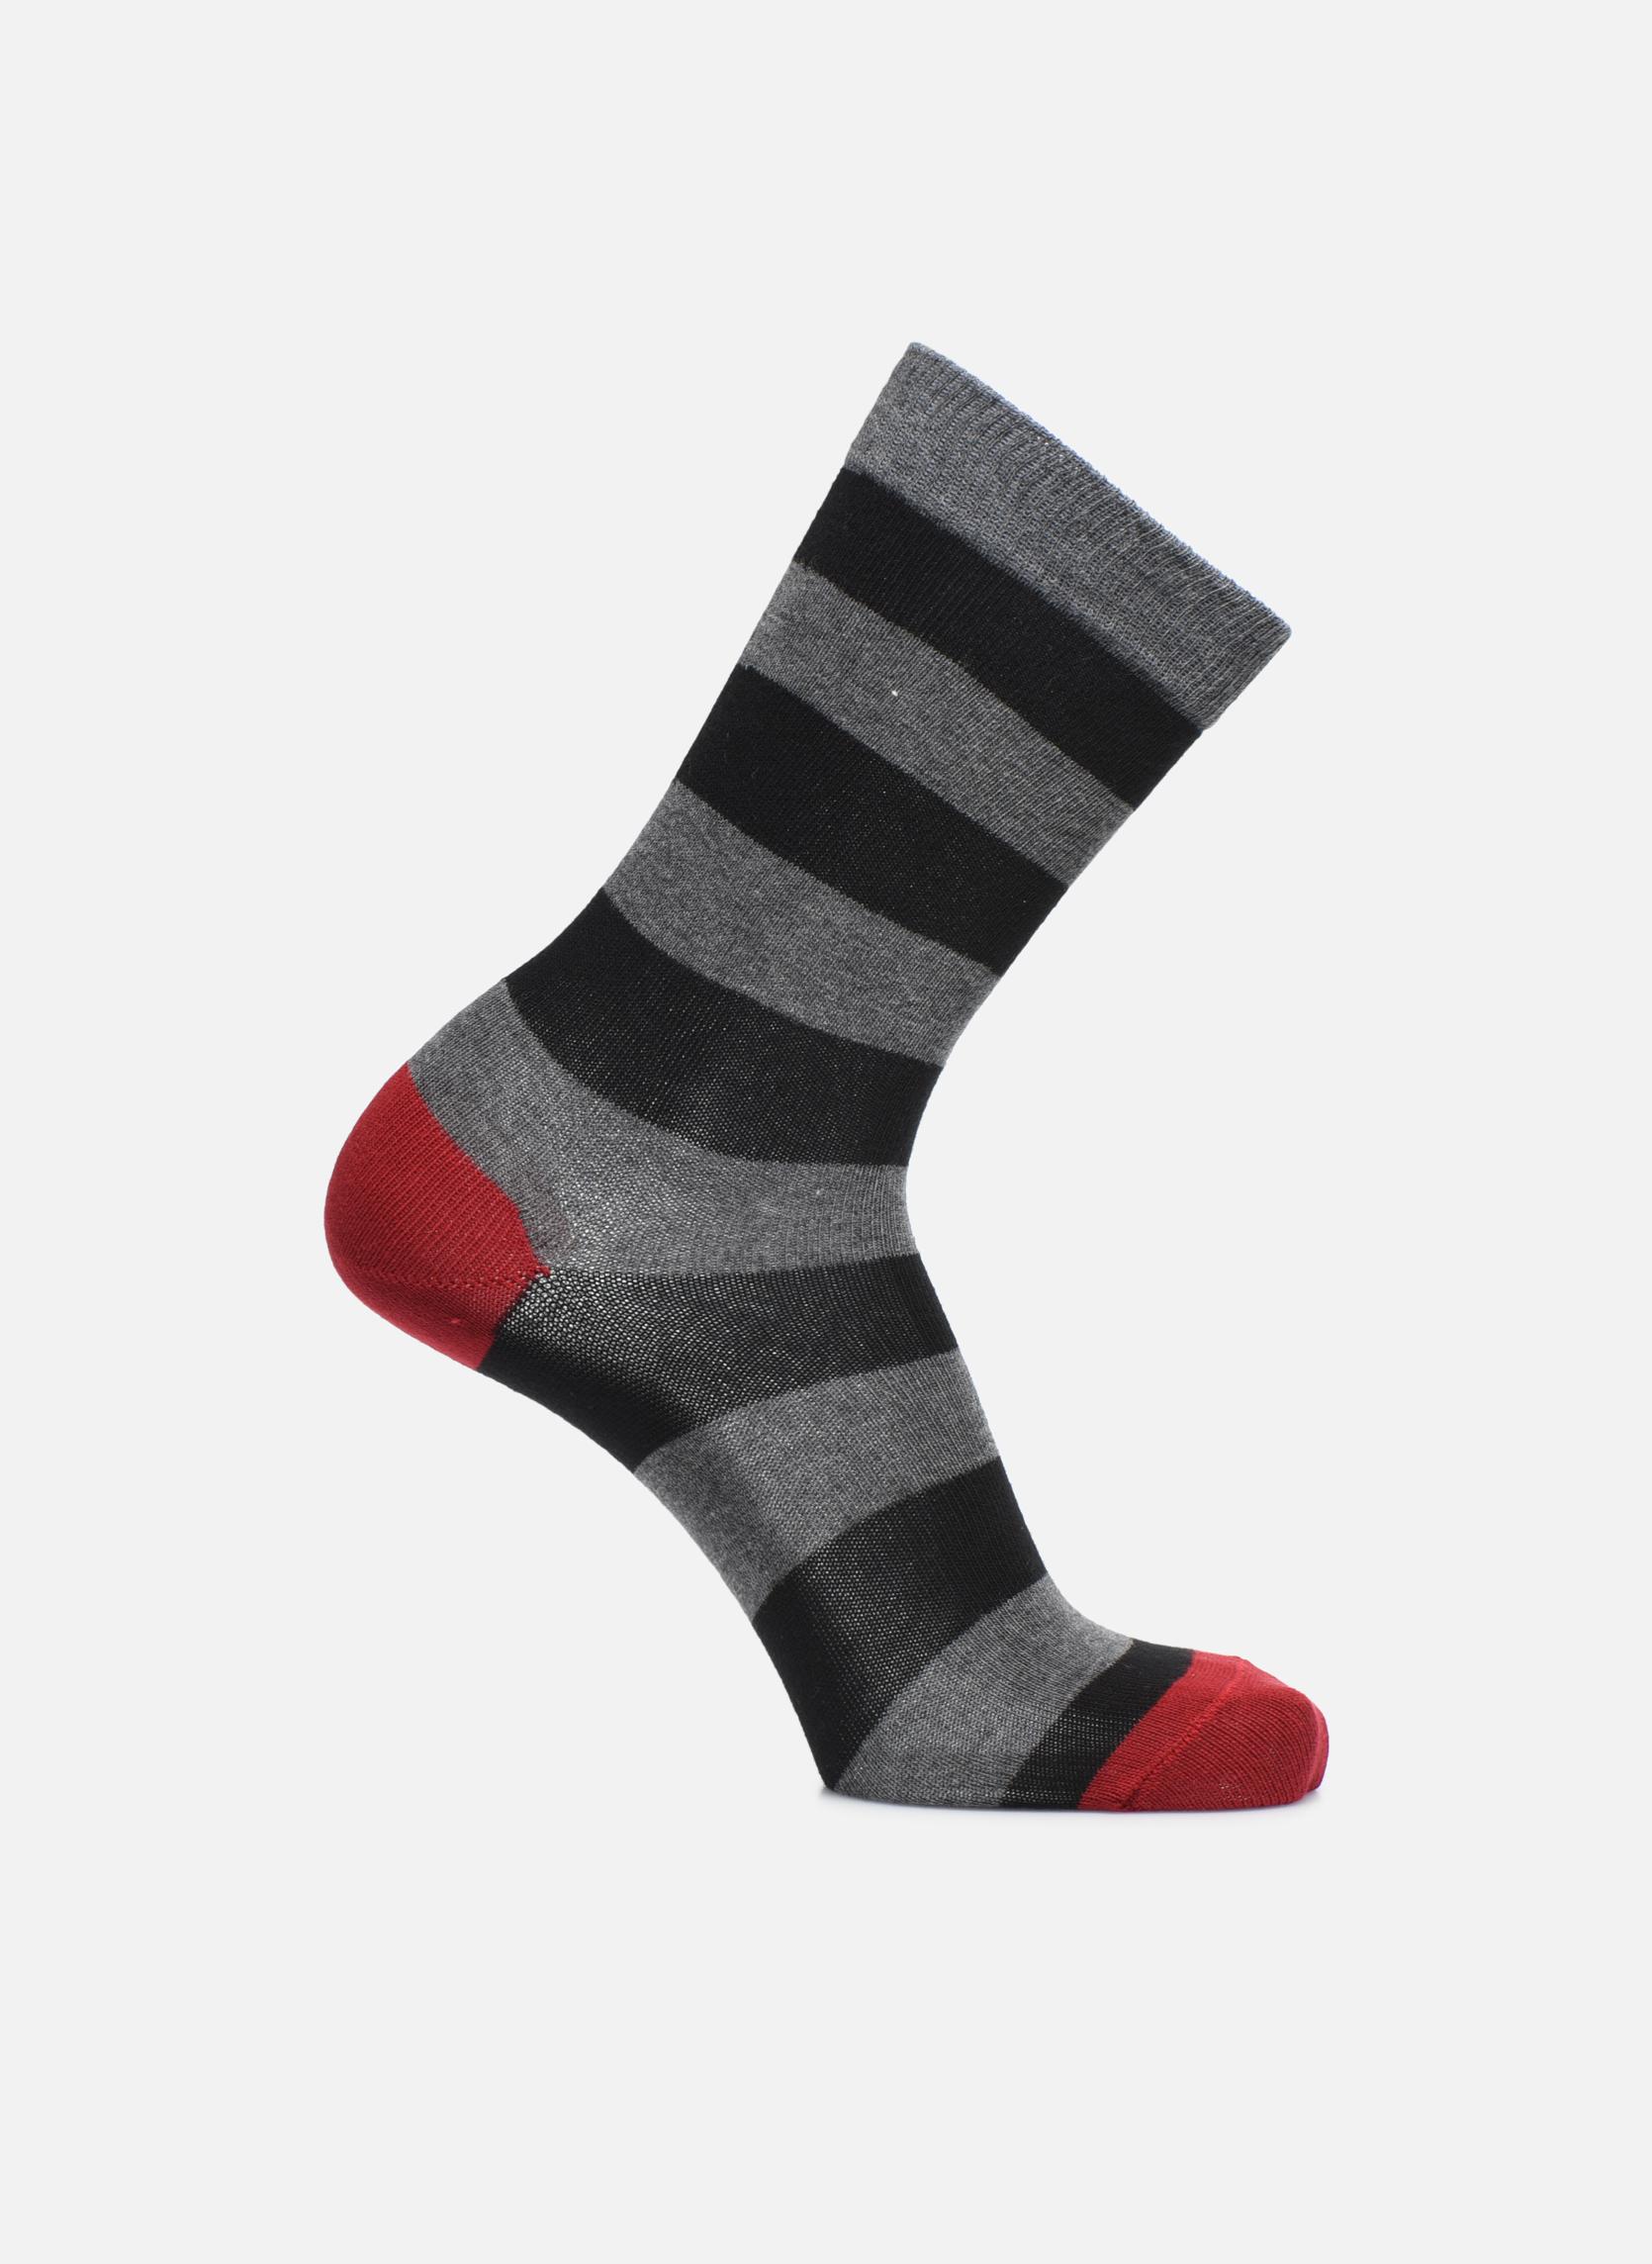 Socken larges rayures gris/noir,